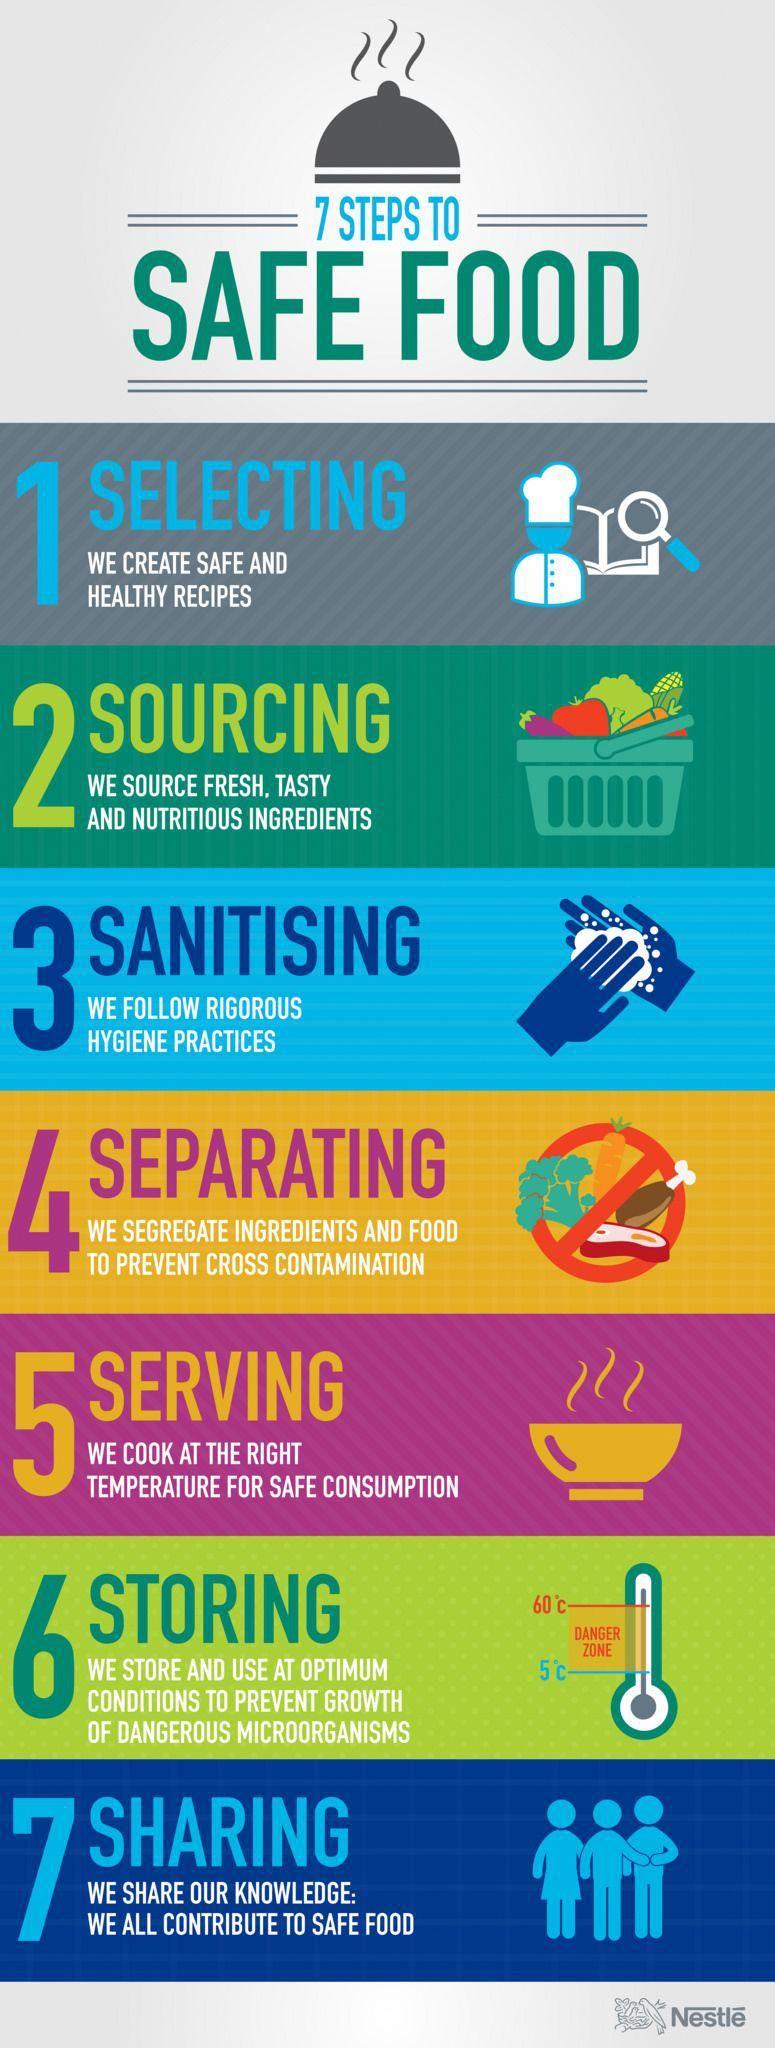 7 tips for preparing safe food We have a certified Food